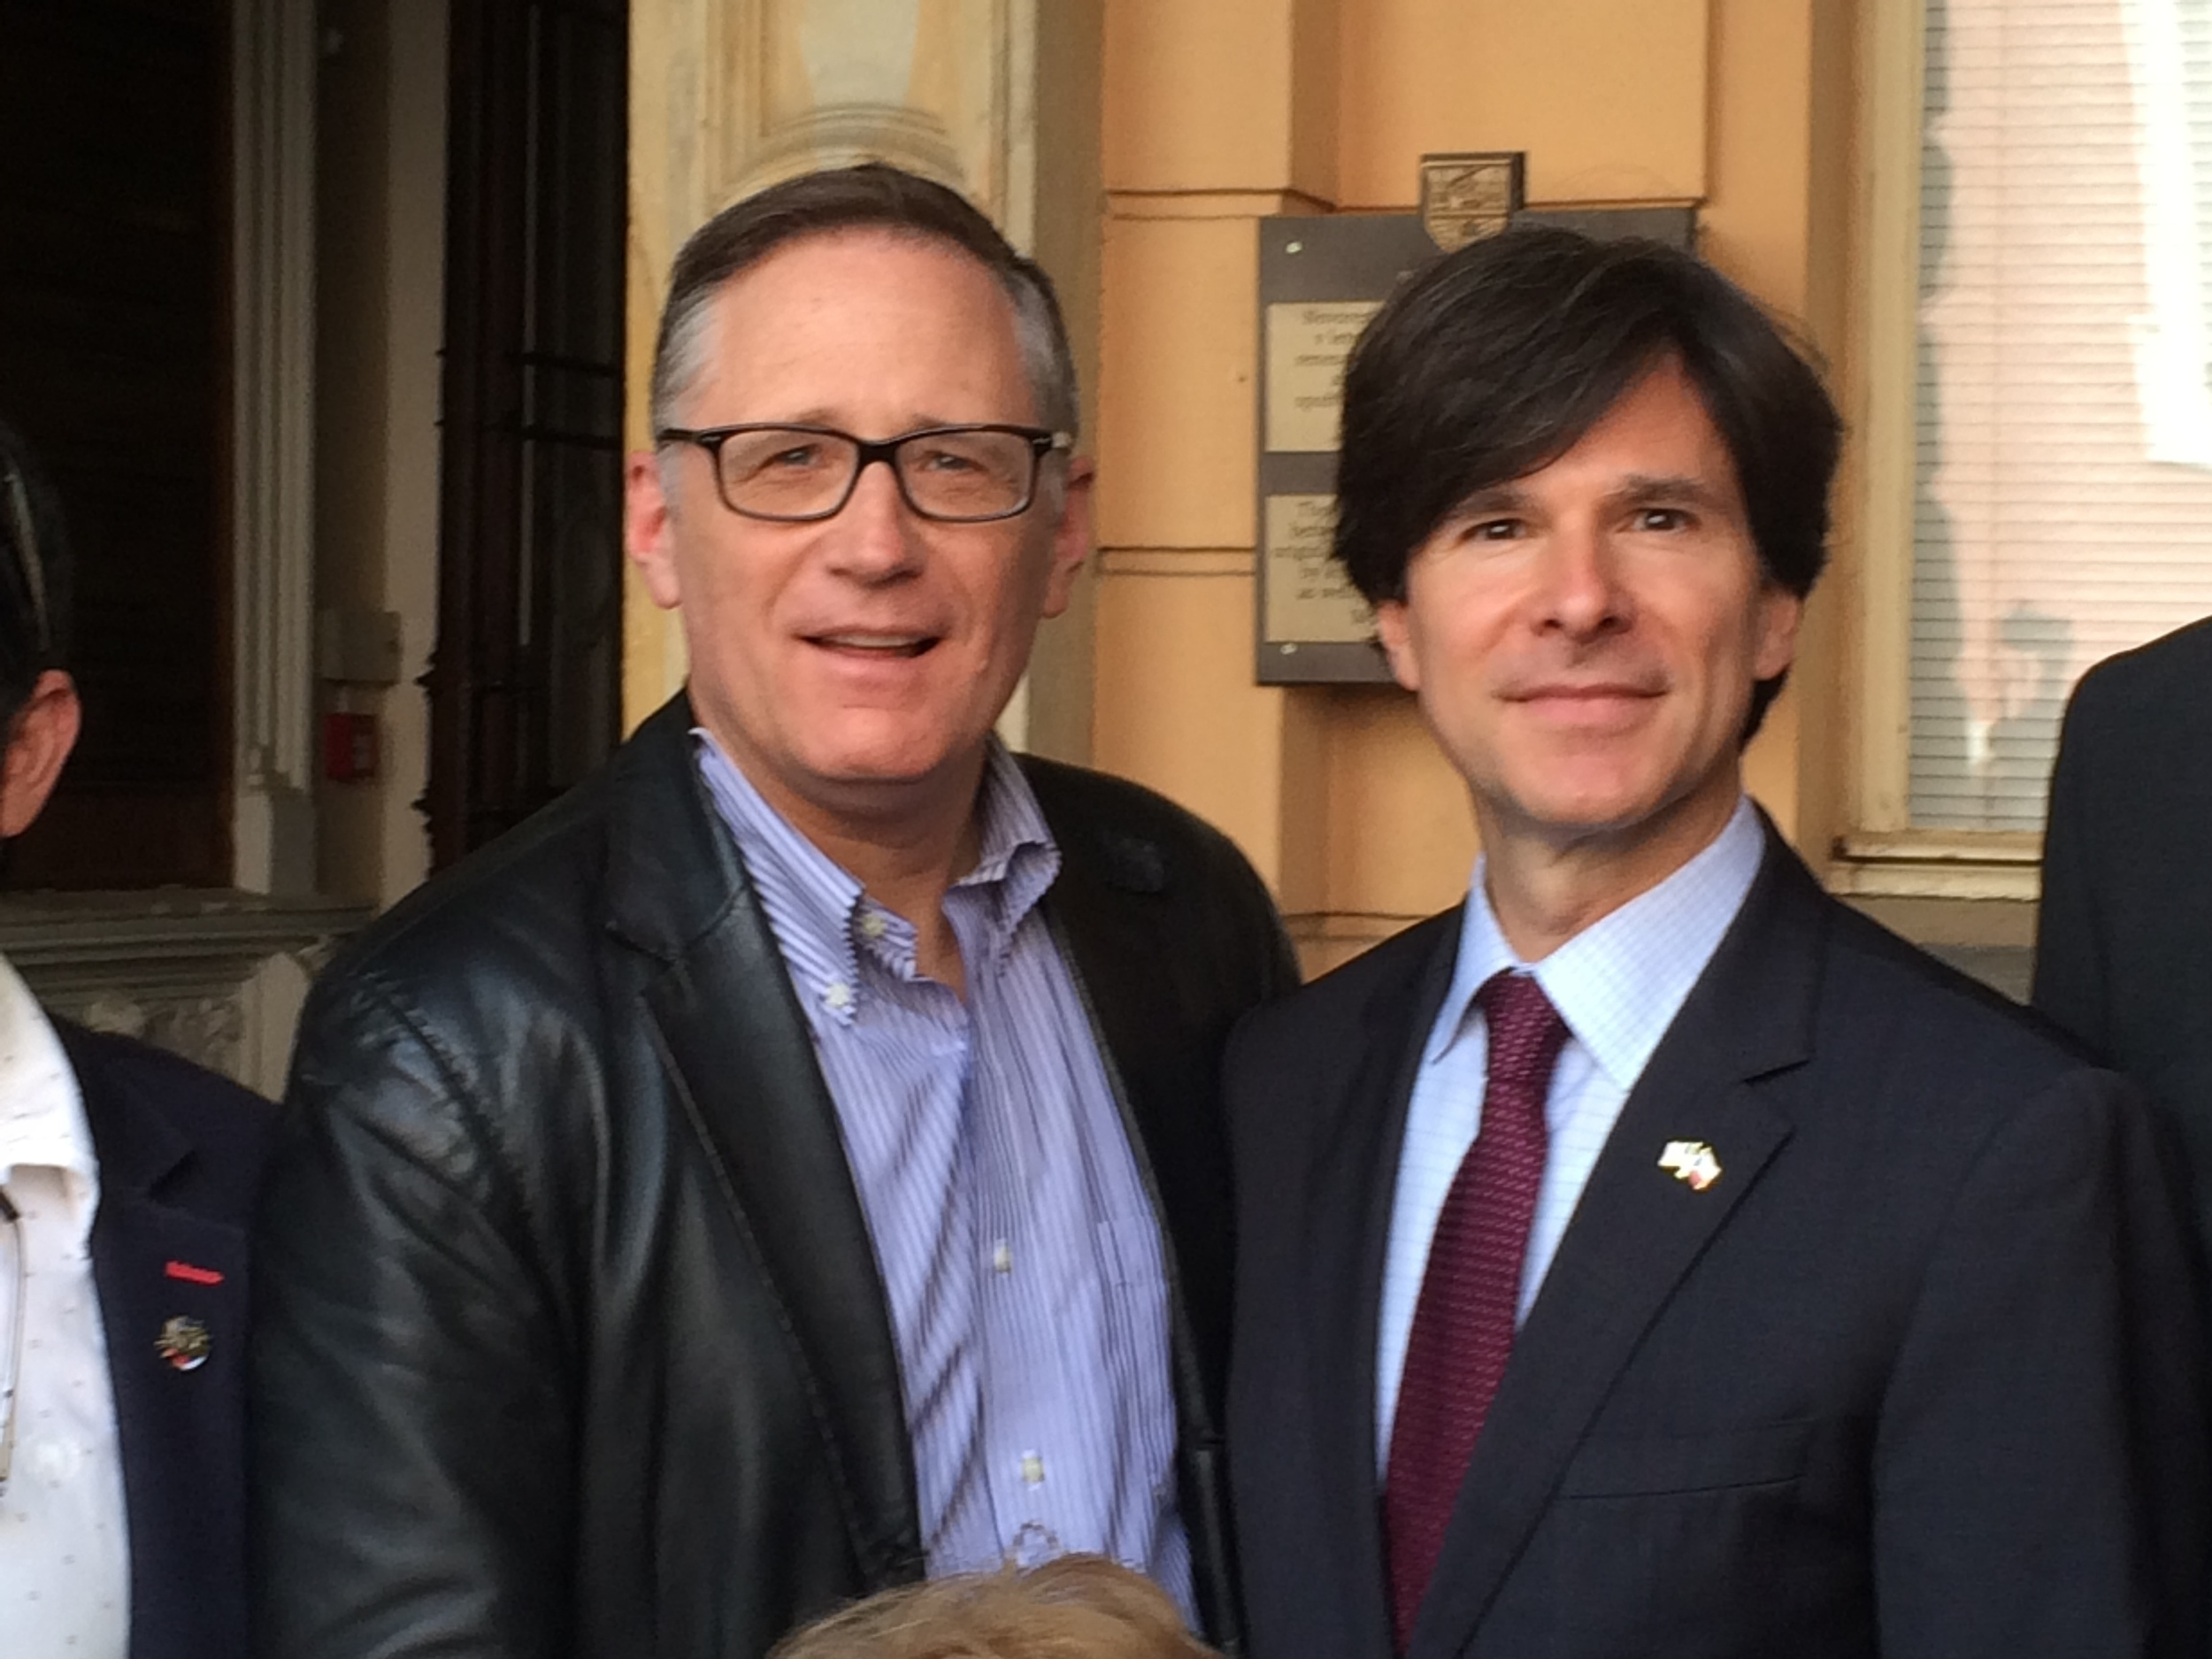 Patrick Dewane with US Ambassador to the Czech Republic, Andrew Schapiro at the 2015 Domazlice, Czech Republic liberation celebration.